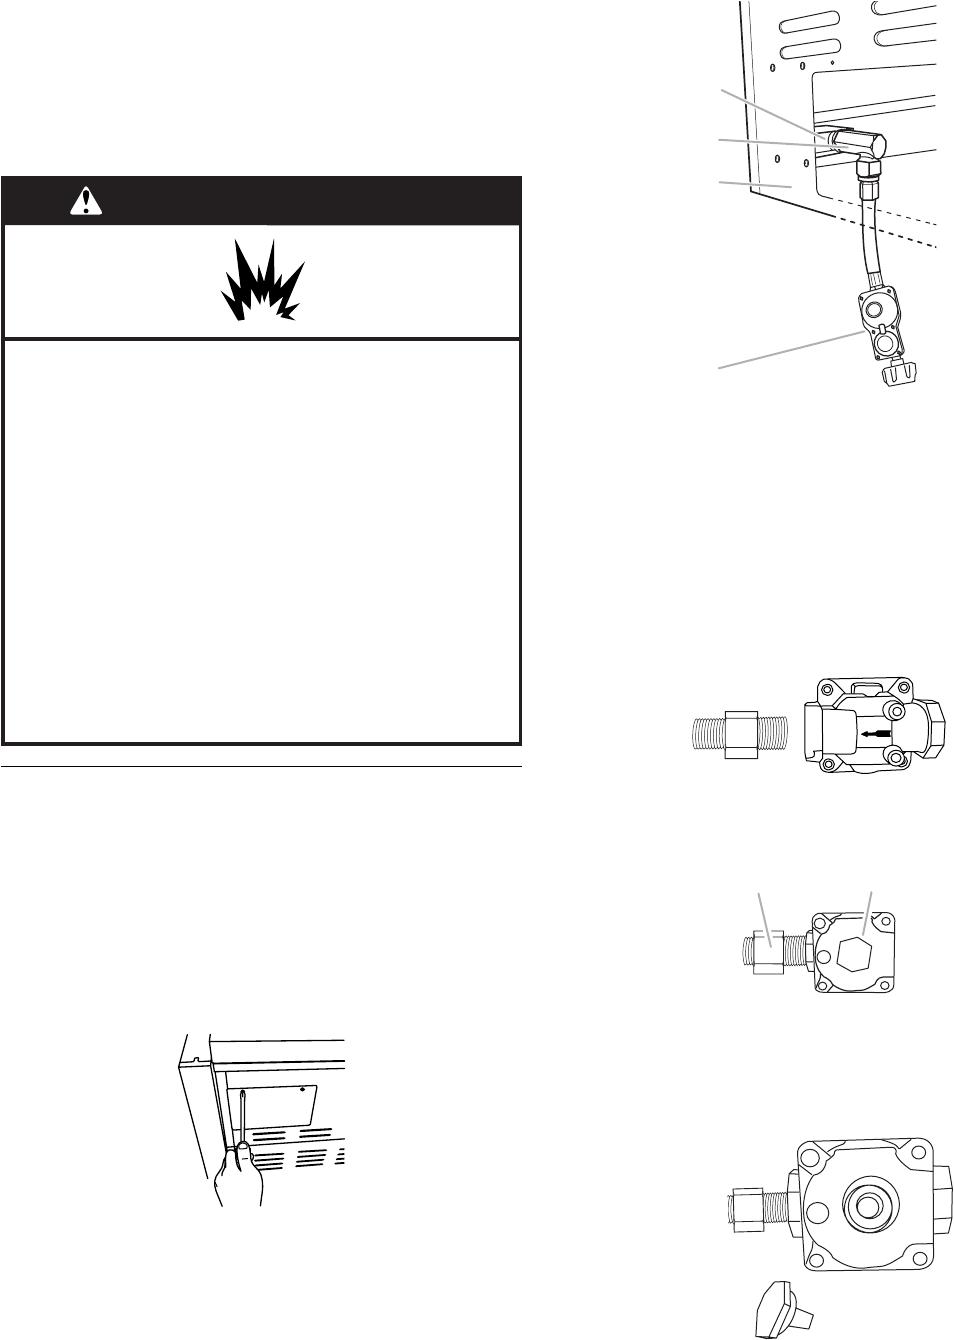 /Interactif Anima /électronique Chewbacca MTW Toys 3108700/